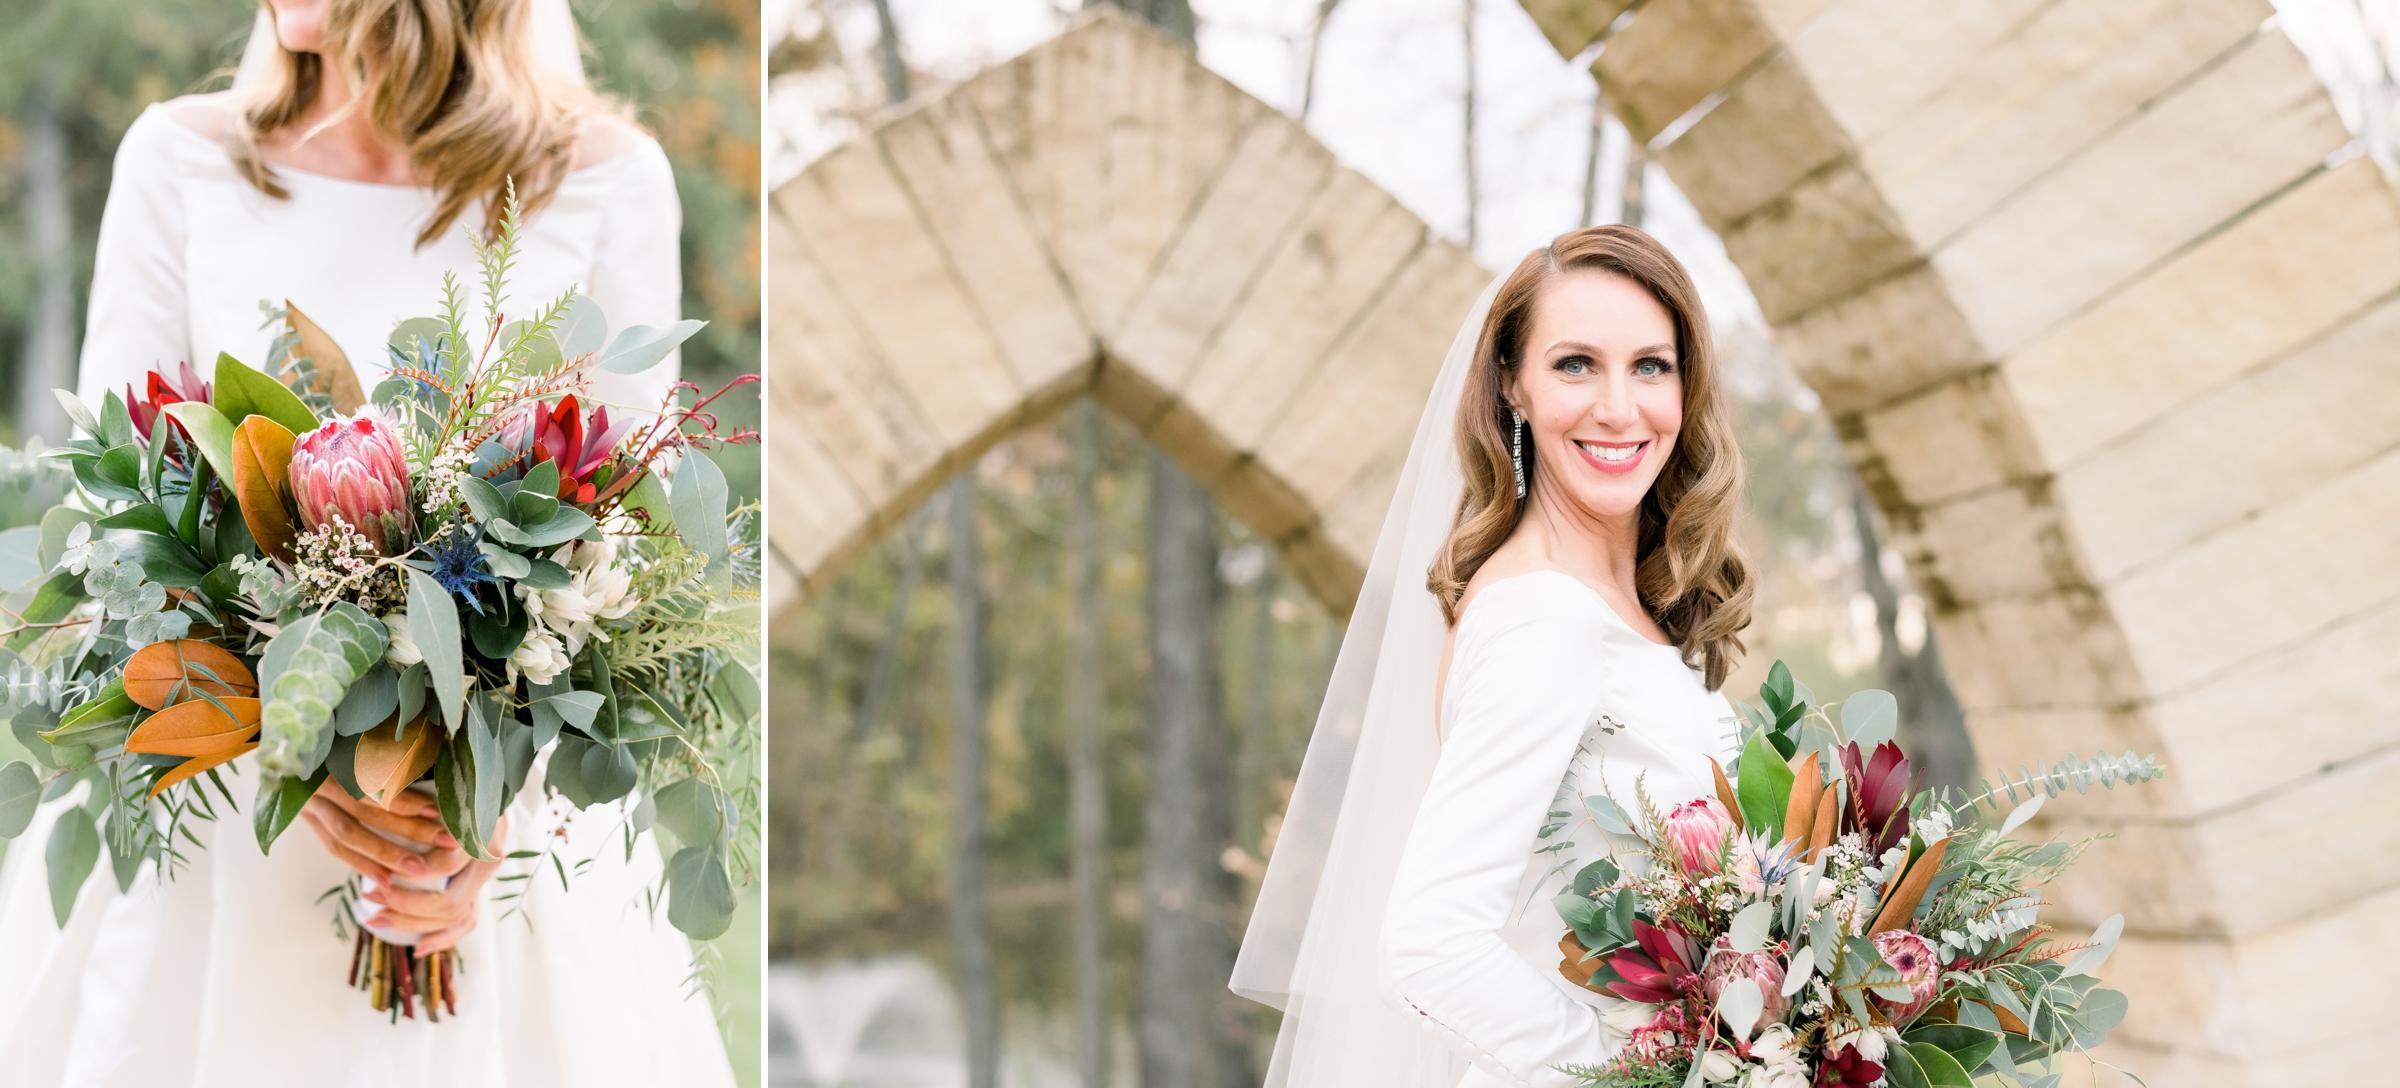 Bride in custom wedding dress by L'ezu Bridal Atelier of Beverly Hills